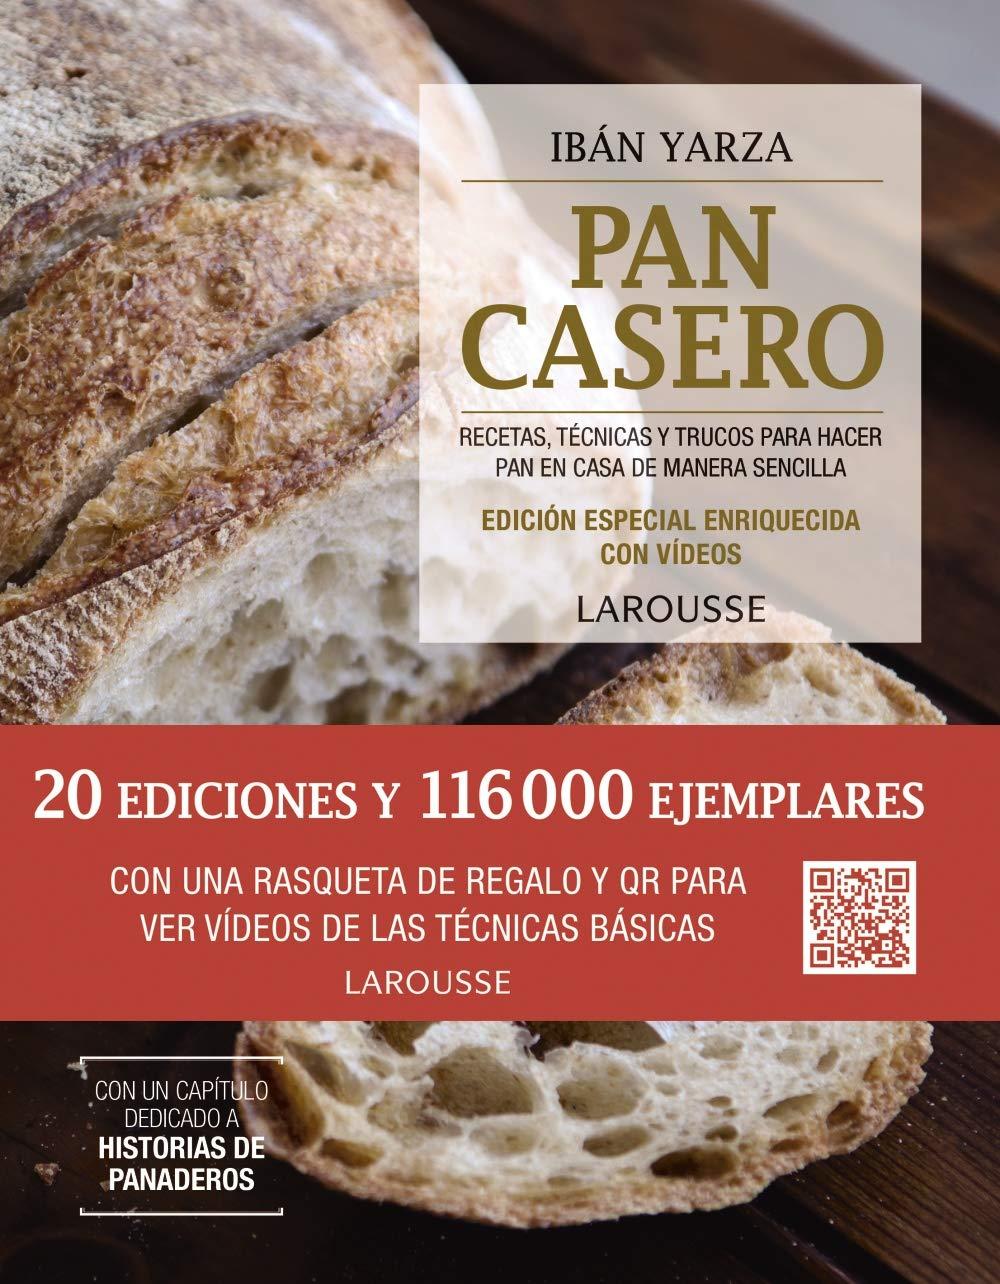 Pan casero. Edición especial LAROUSSE - Libros Ilustrados/ Prácticos - Gastronomía: Amazon.es: Yarza, Ibán, Yarza, Ibán: Libros